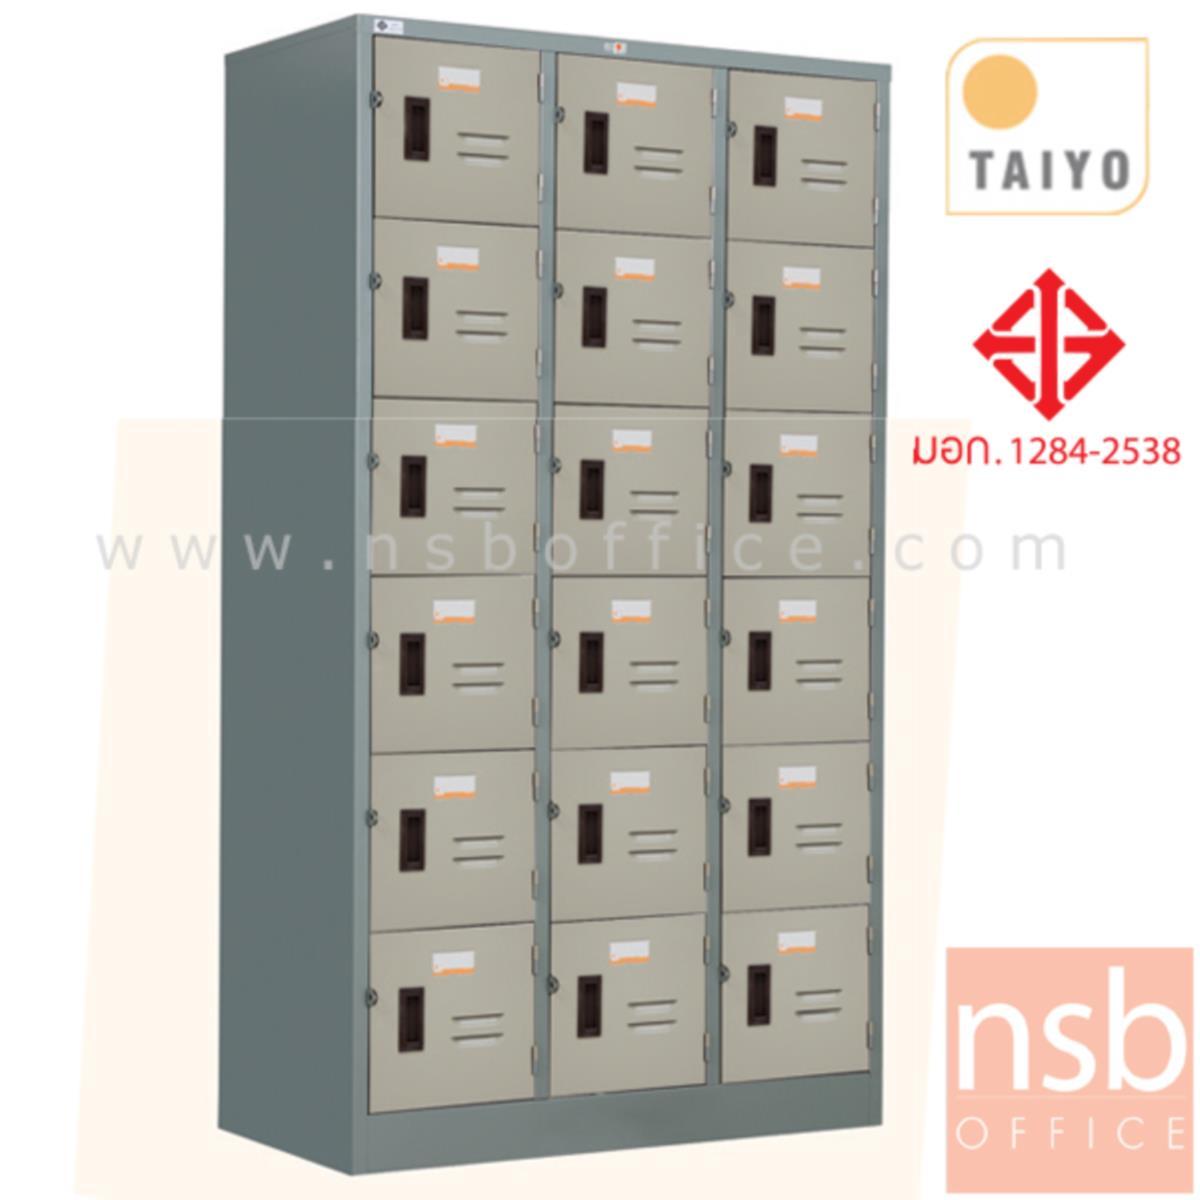 E03A005:ตู้ล็อกเกอร์เหล็ก 18 ประตู กุญแจพร้อมสายยู (มาตรฐาน มอก. 0.7 mm) รุ่น LK-018